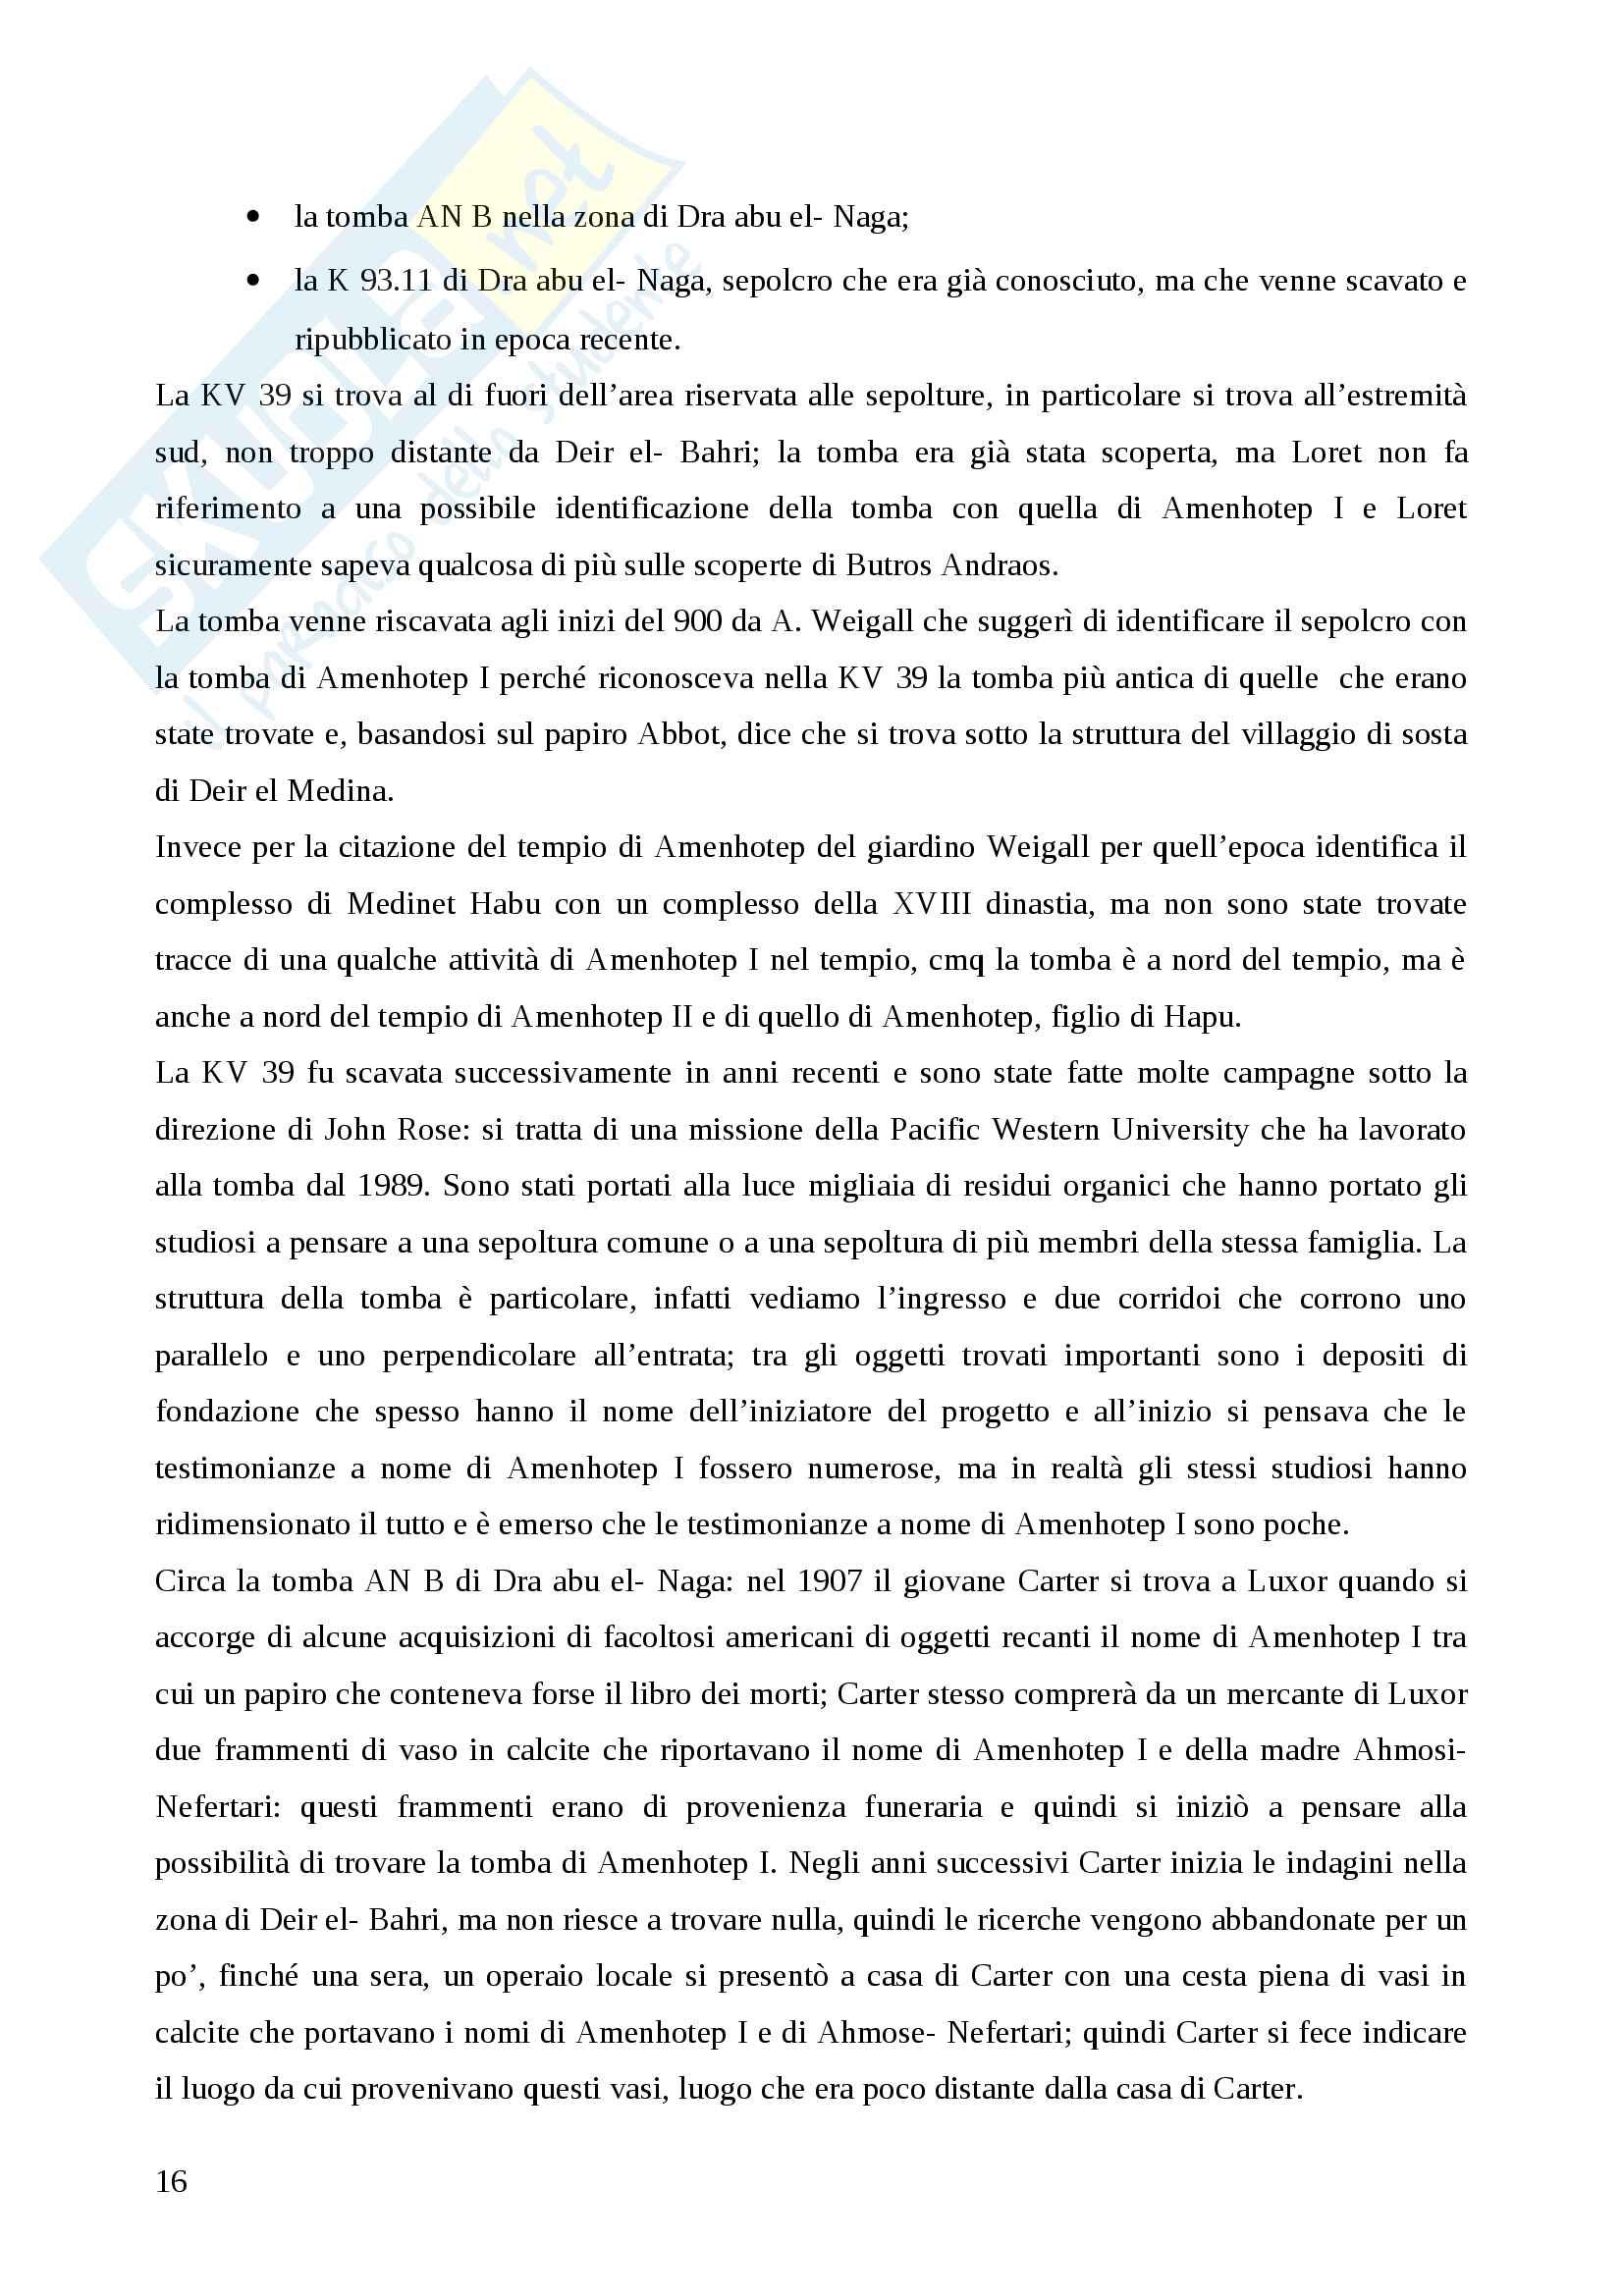 Egittologia: Appunti relativi al III modulo Pag. 16